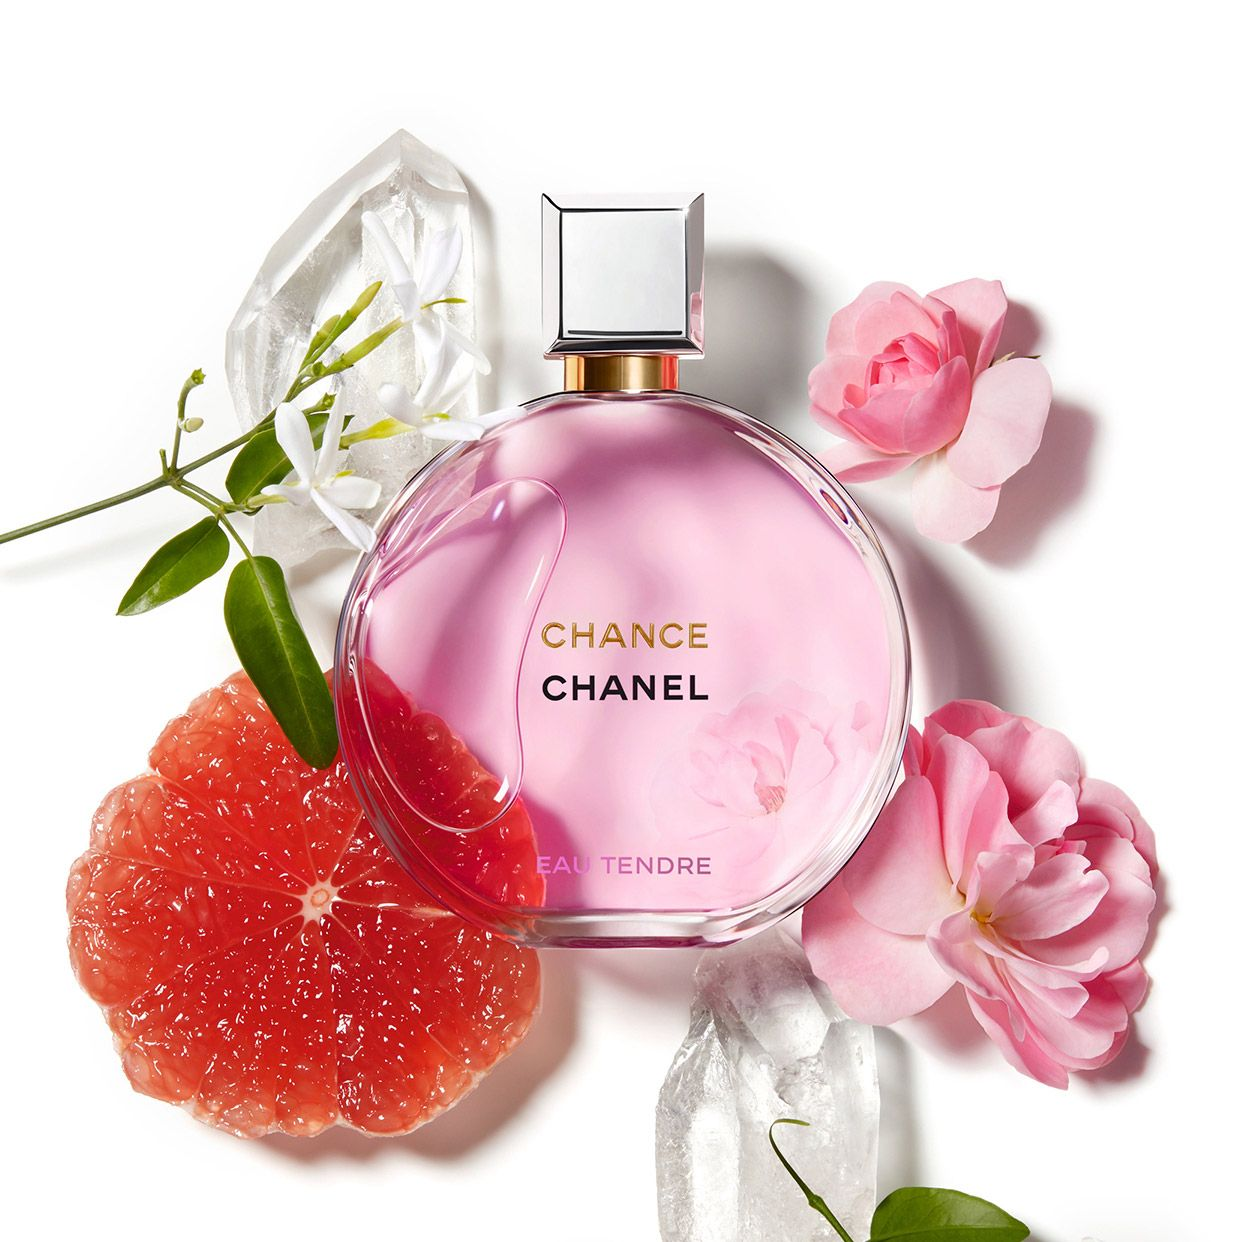 New Chance Eau Tendre Fragrance Fragrance Chanel Chanel In